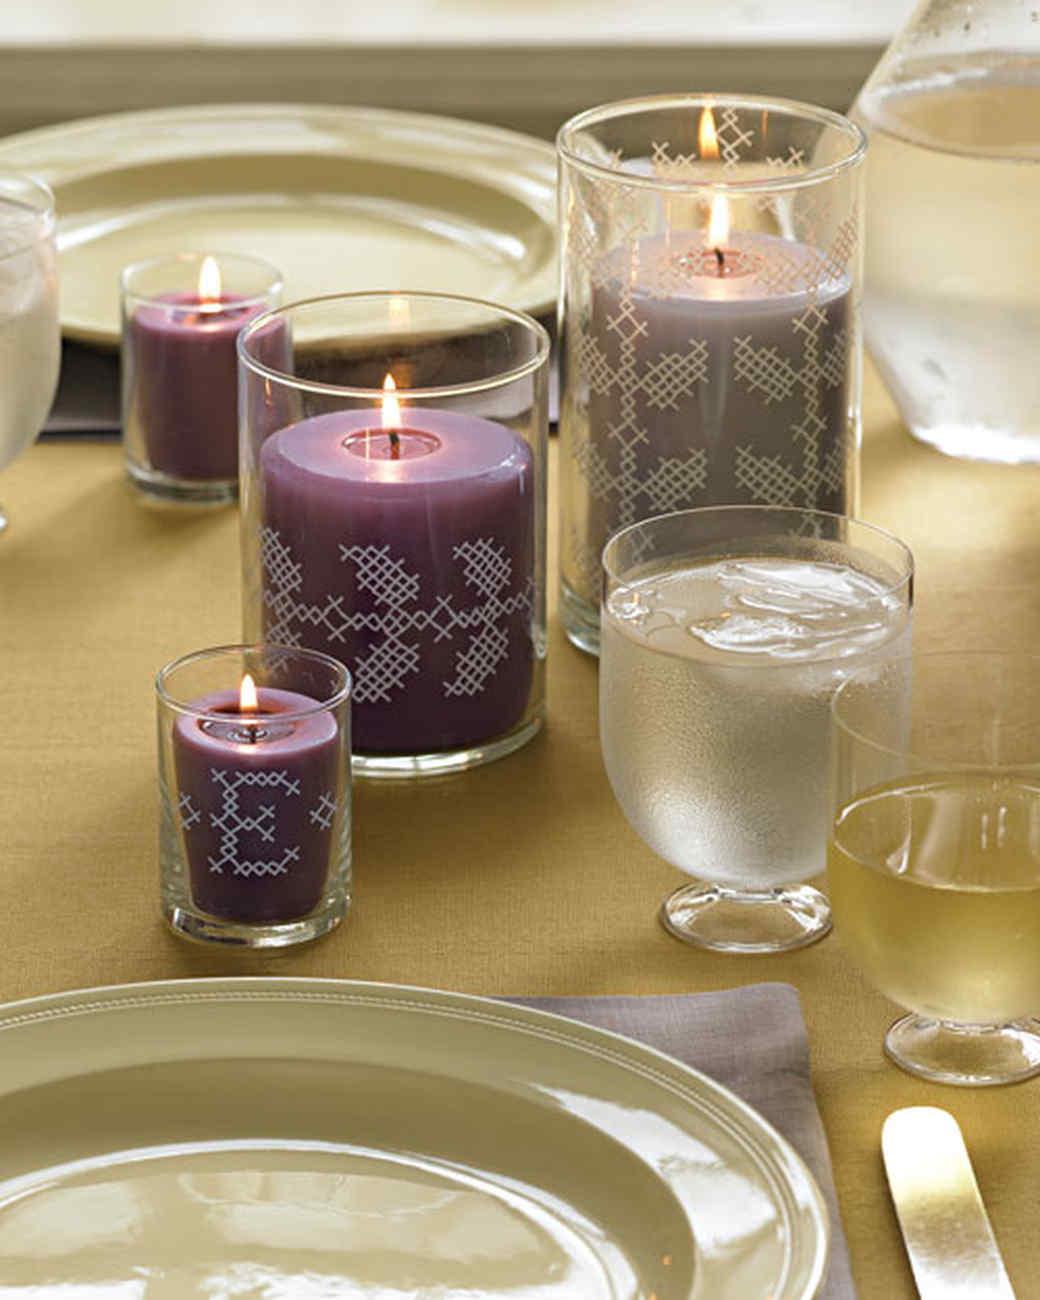 la103268_1107_candles.jpg